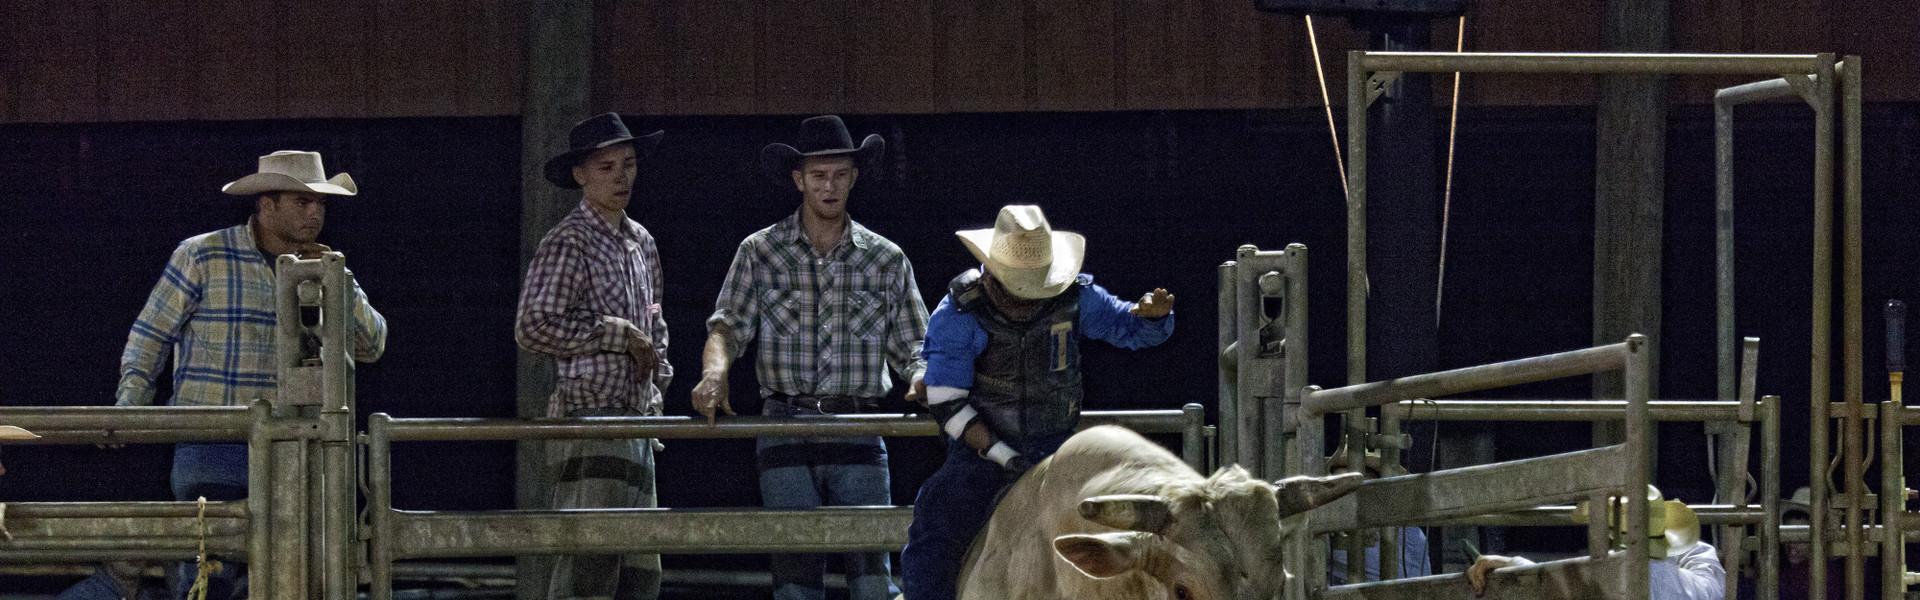 Florida Rodeo near Orlando | Bull Riding at Rodeo